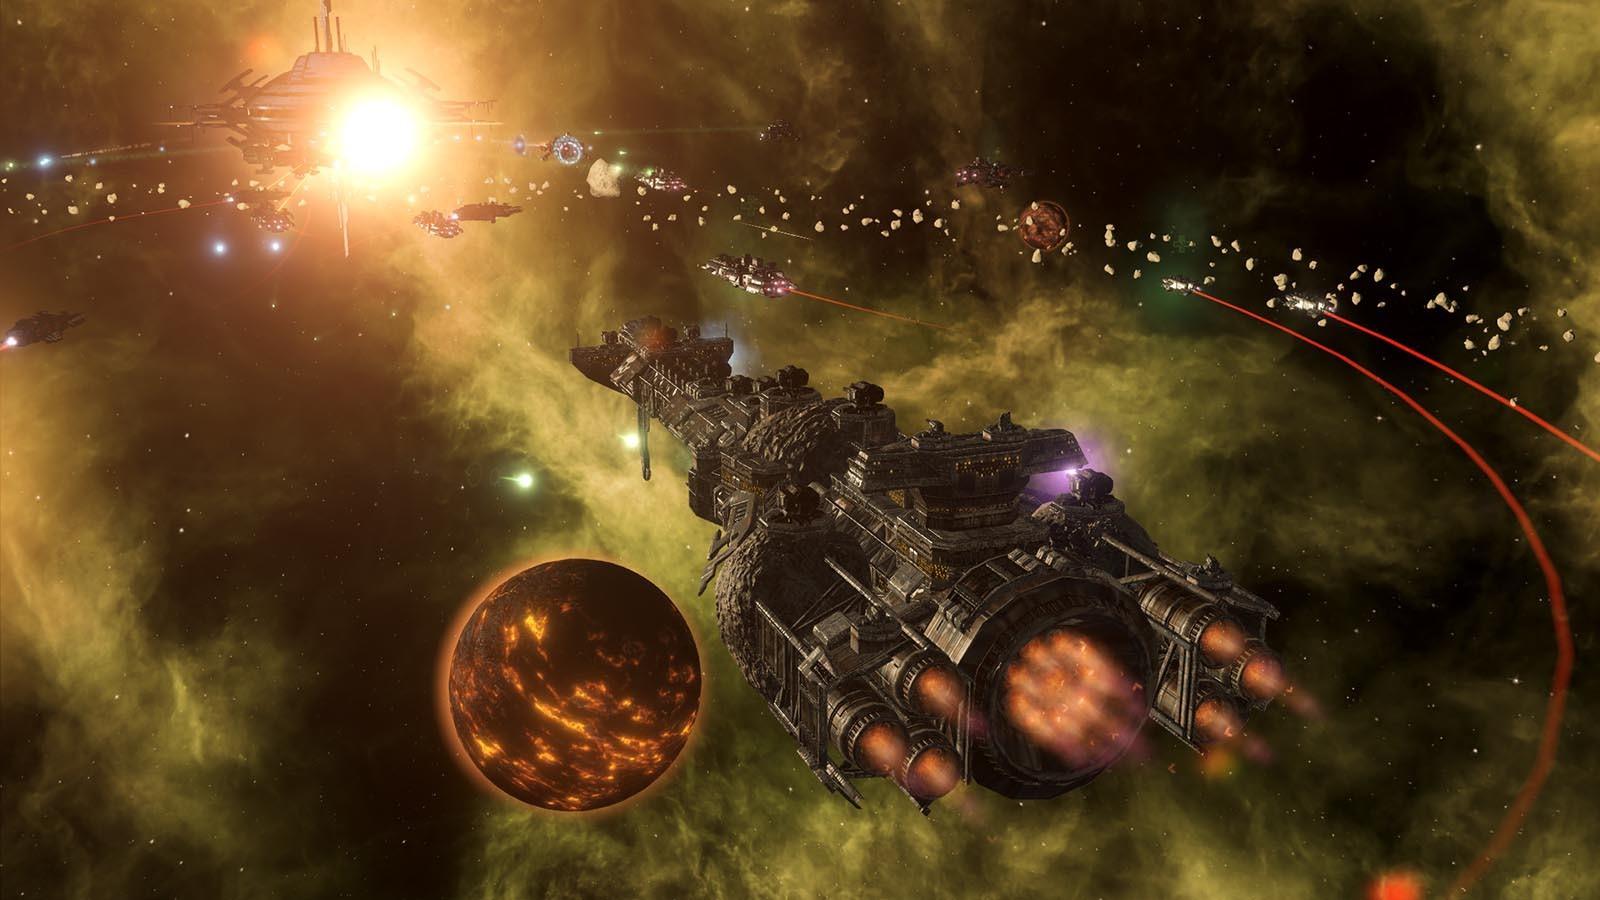 Stellaris: Apocalypse | ROW (e445a894-0f57-4d9c-a4b1-a6809c836ba8)